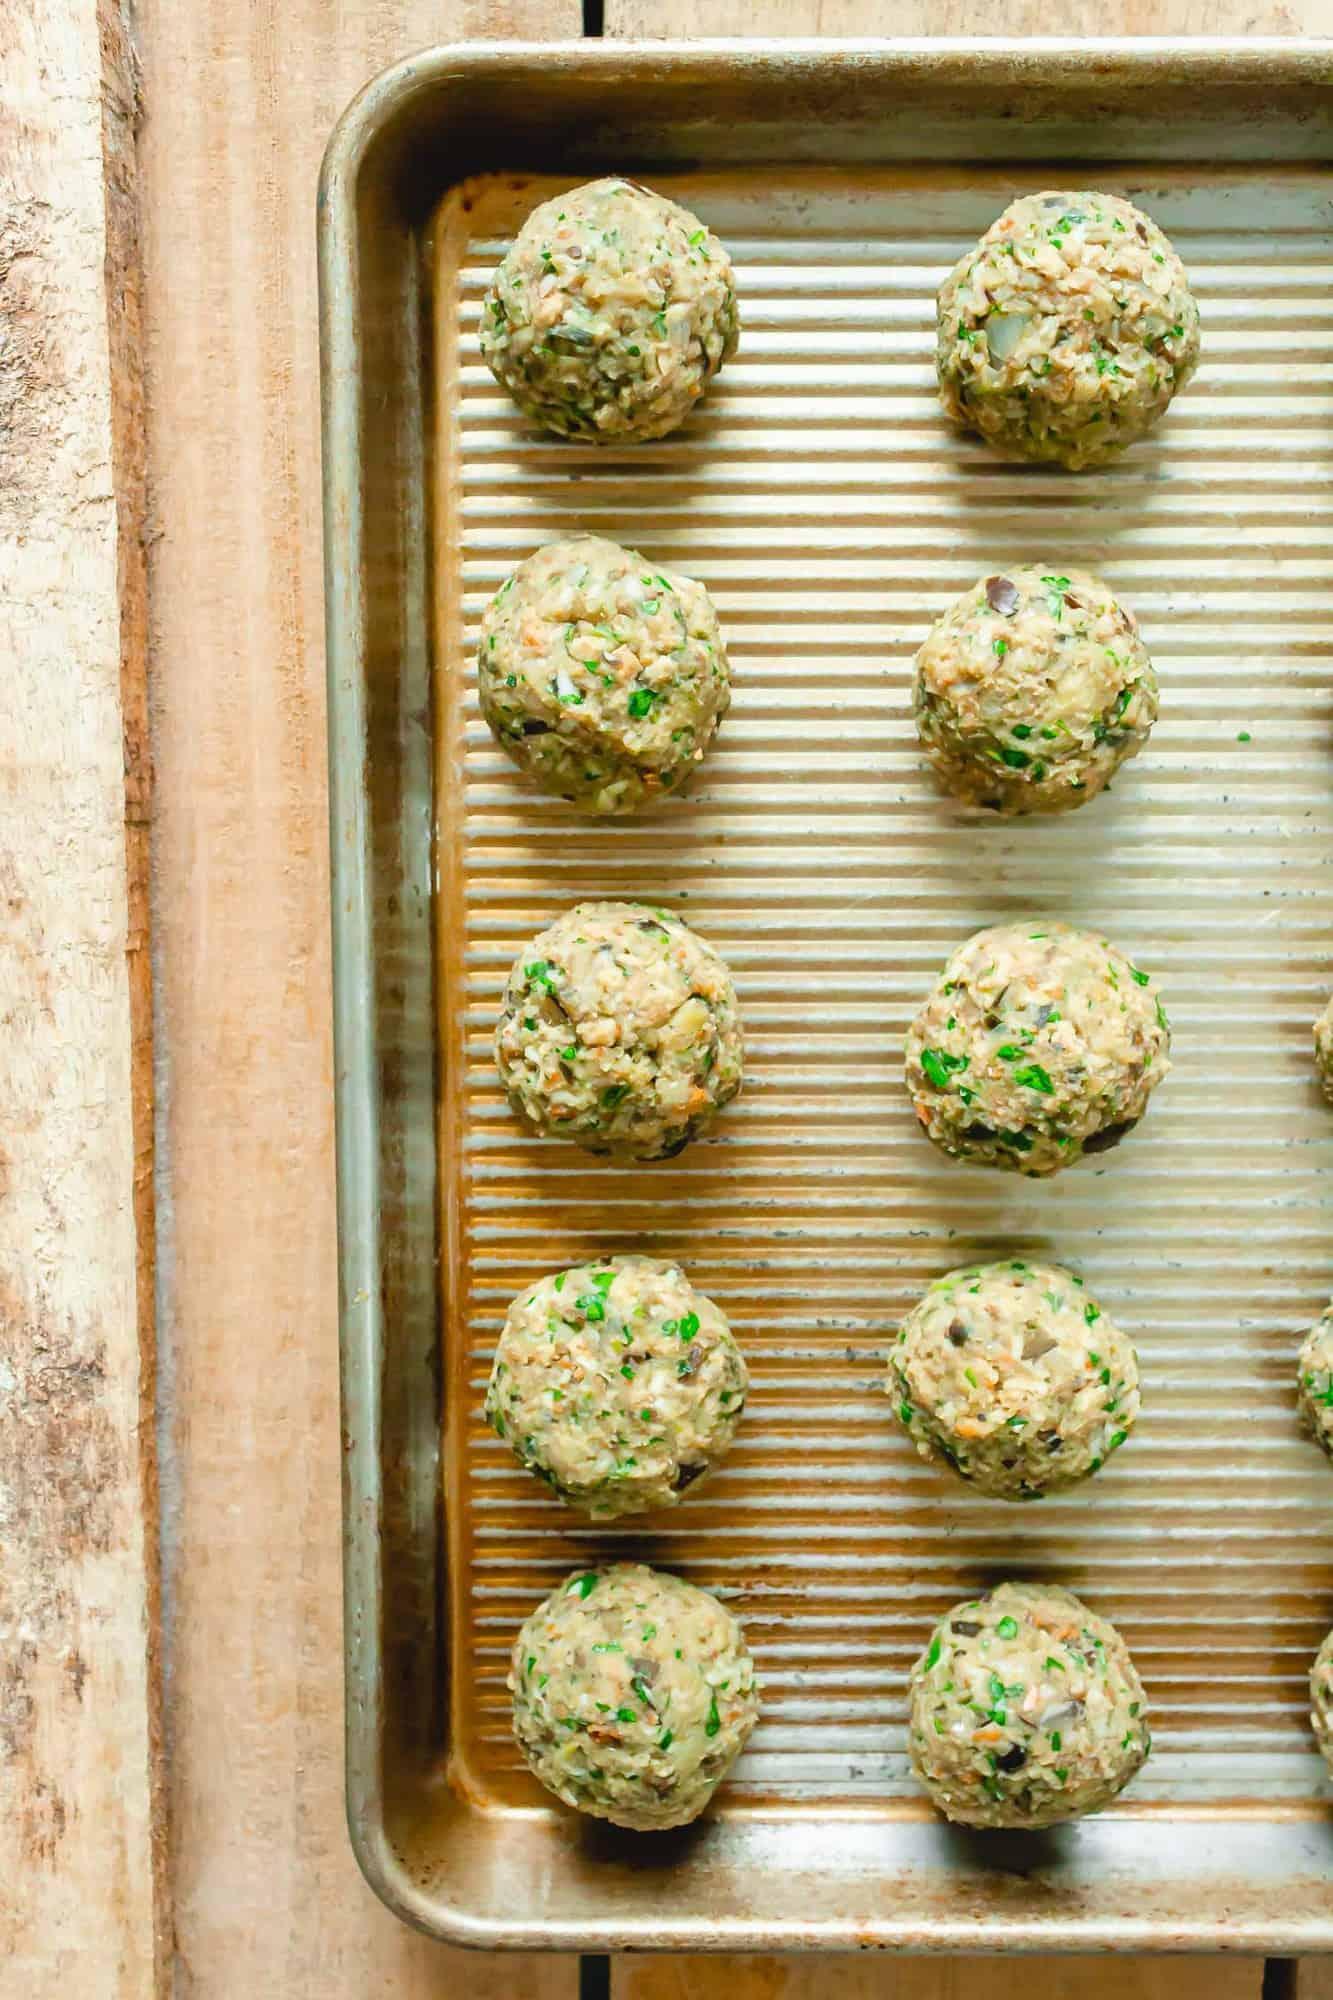 Uncooked vegetarian meatballs on a baking sheet.